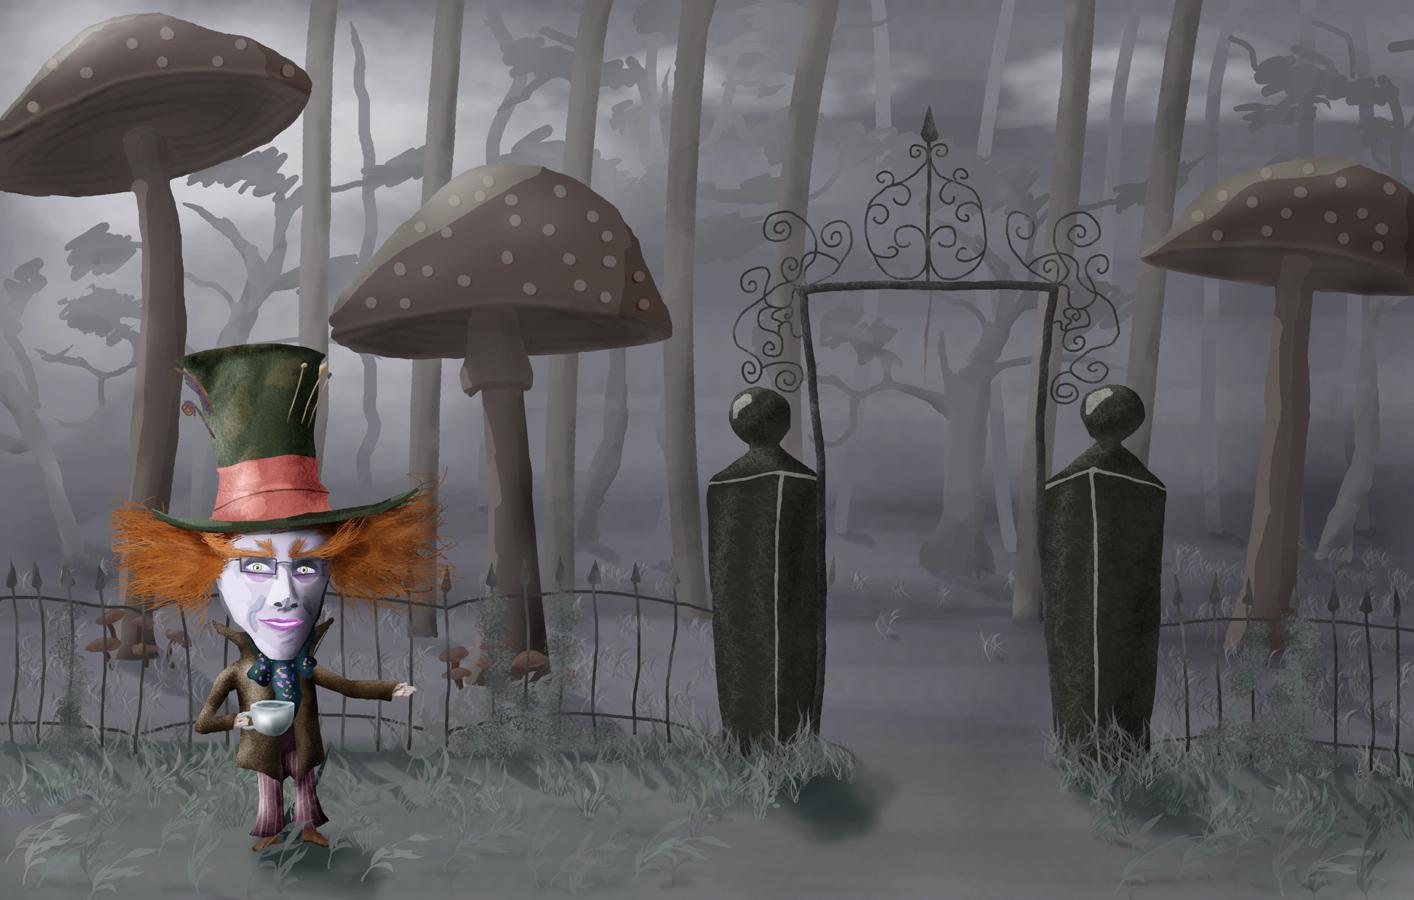 Kalais in Wonderland by kalais